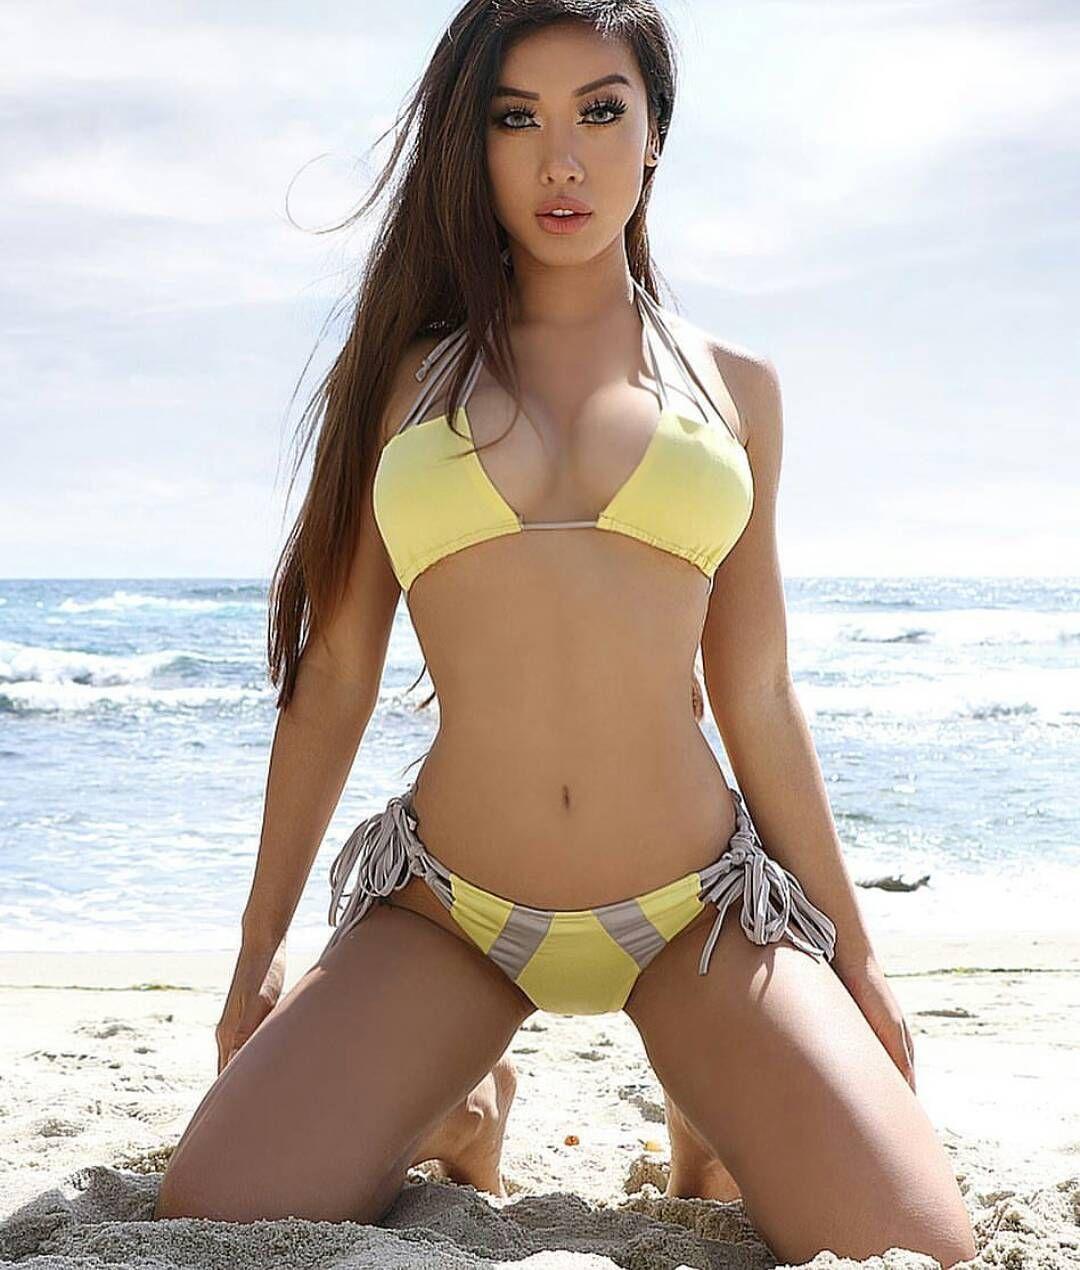 Sexy Asian Photos Pinay Girl | PURRfect V. | Pinterest